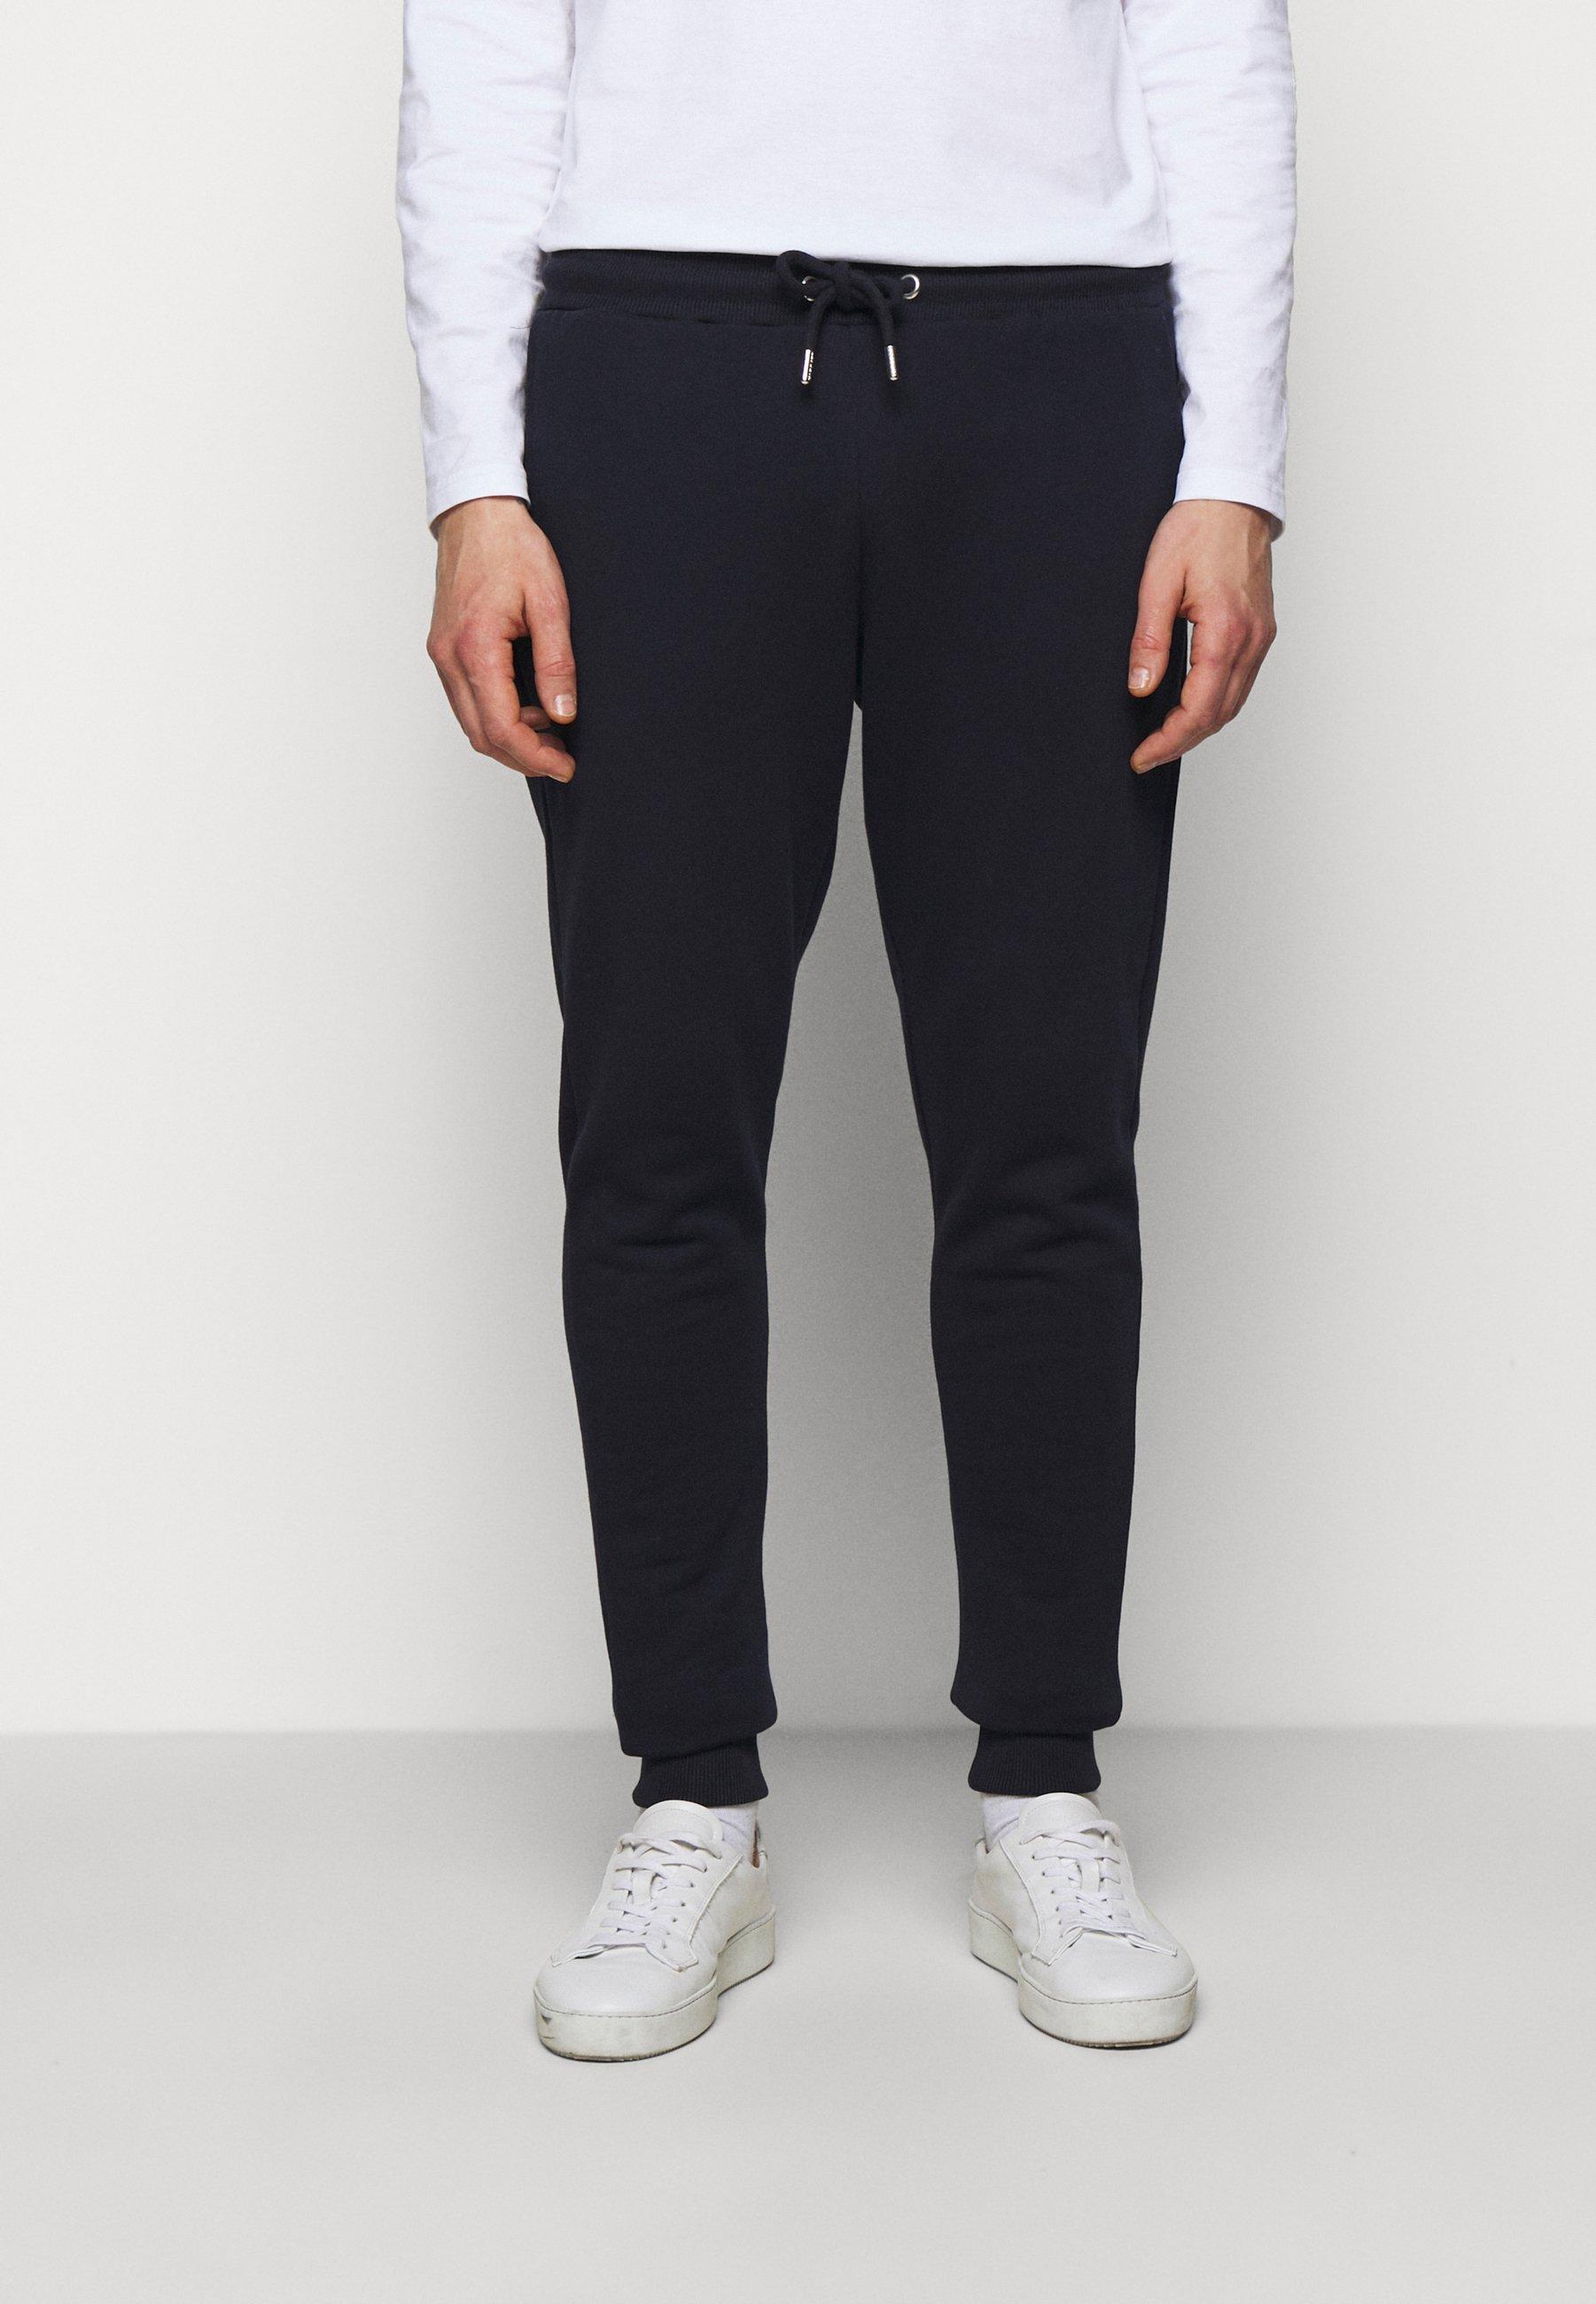 Herren PANTS - Jogginghose - navy/white